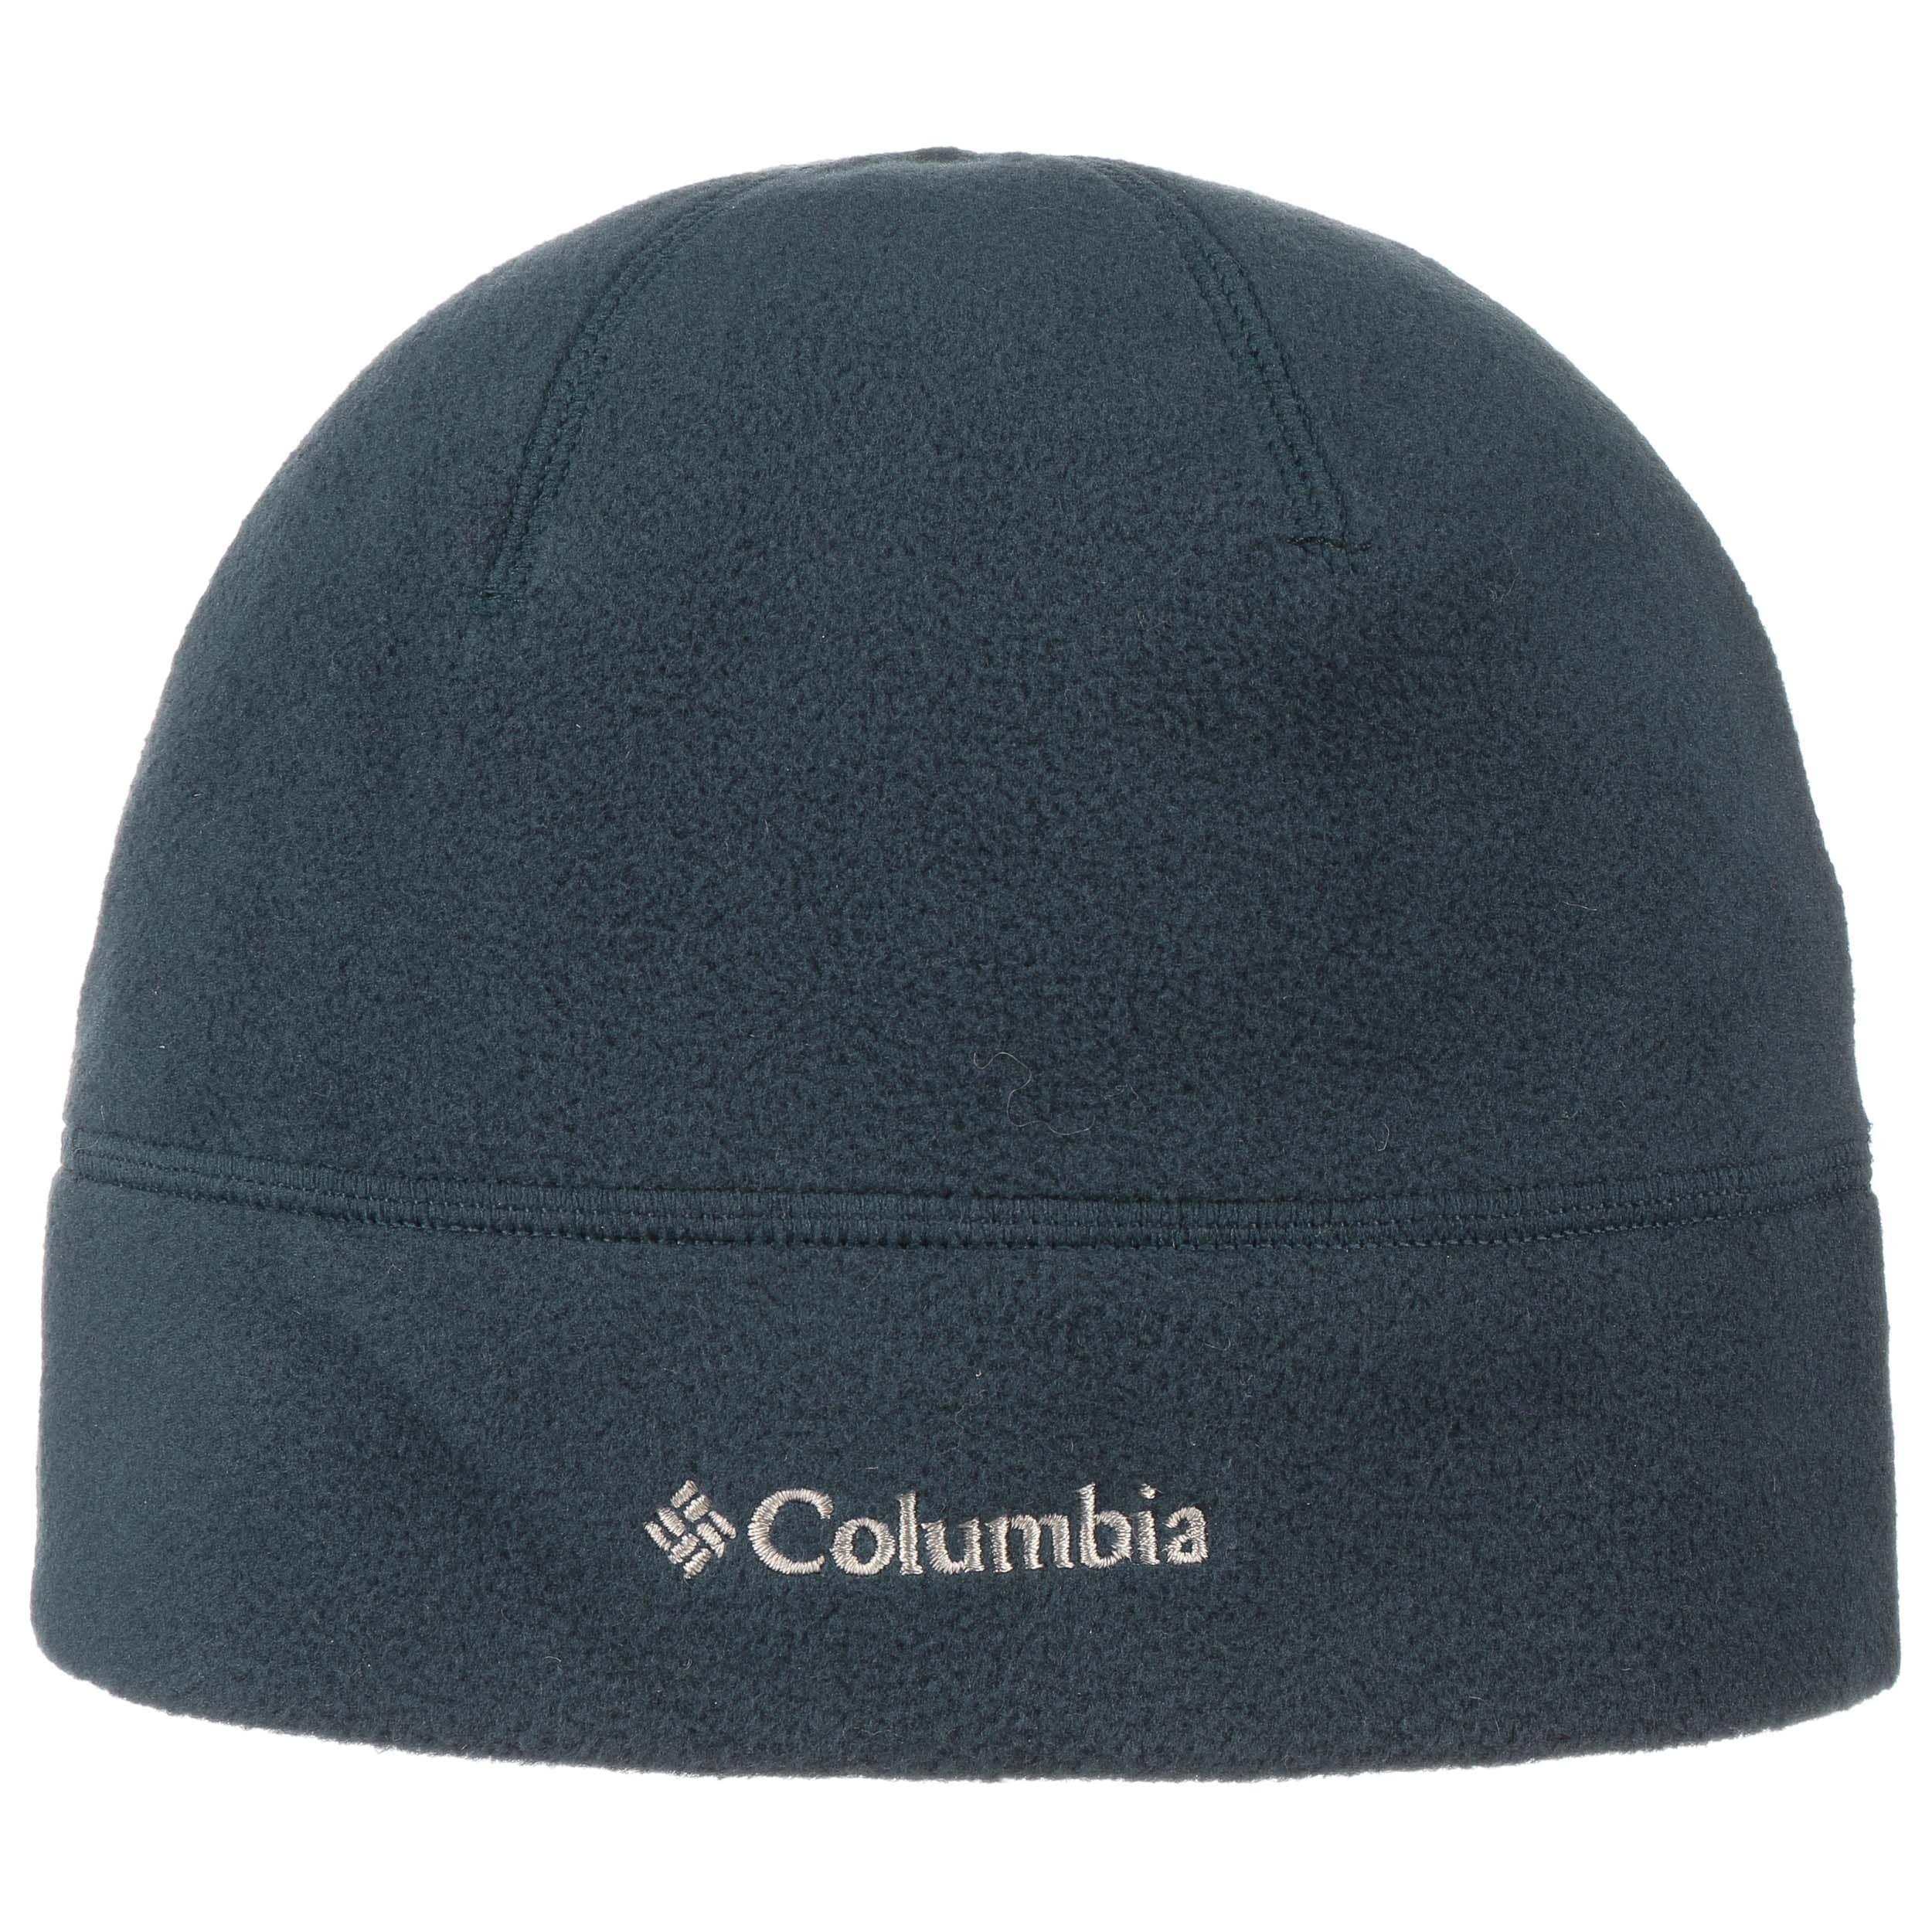 9dd0adfae29 ... Thermarator Fleece Beanie by Columbia - navy 5 ...